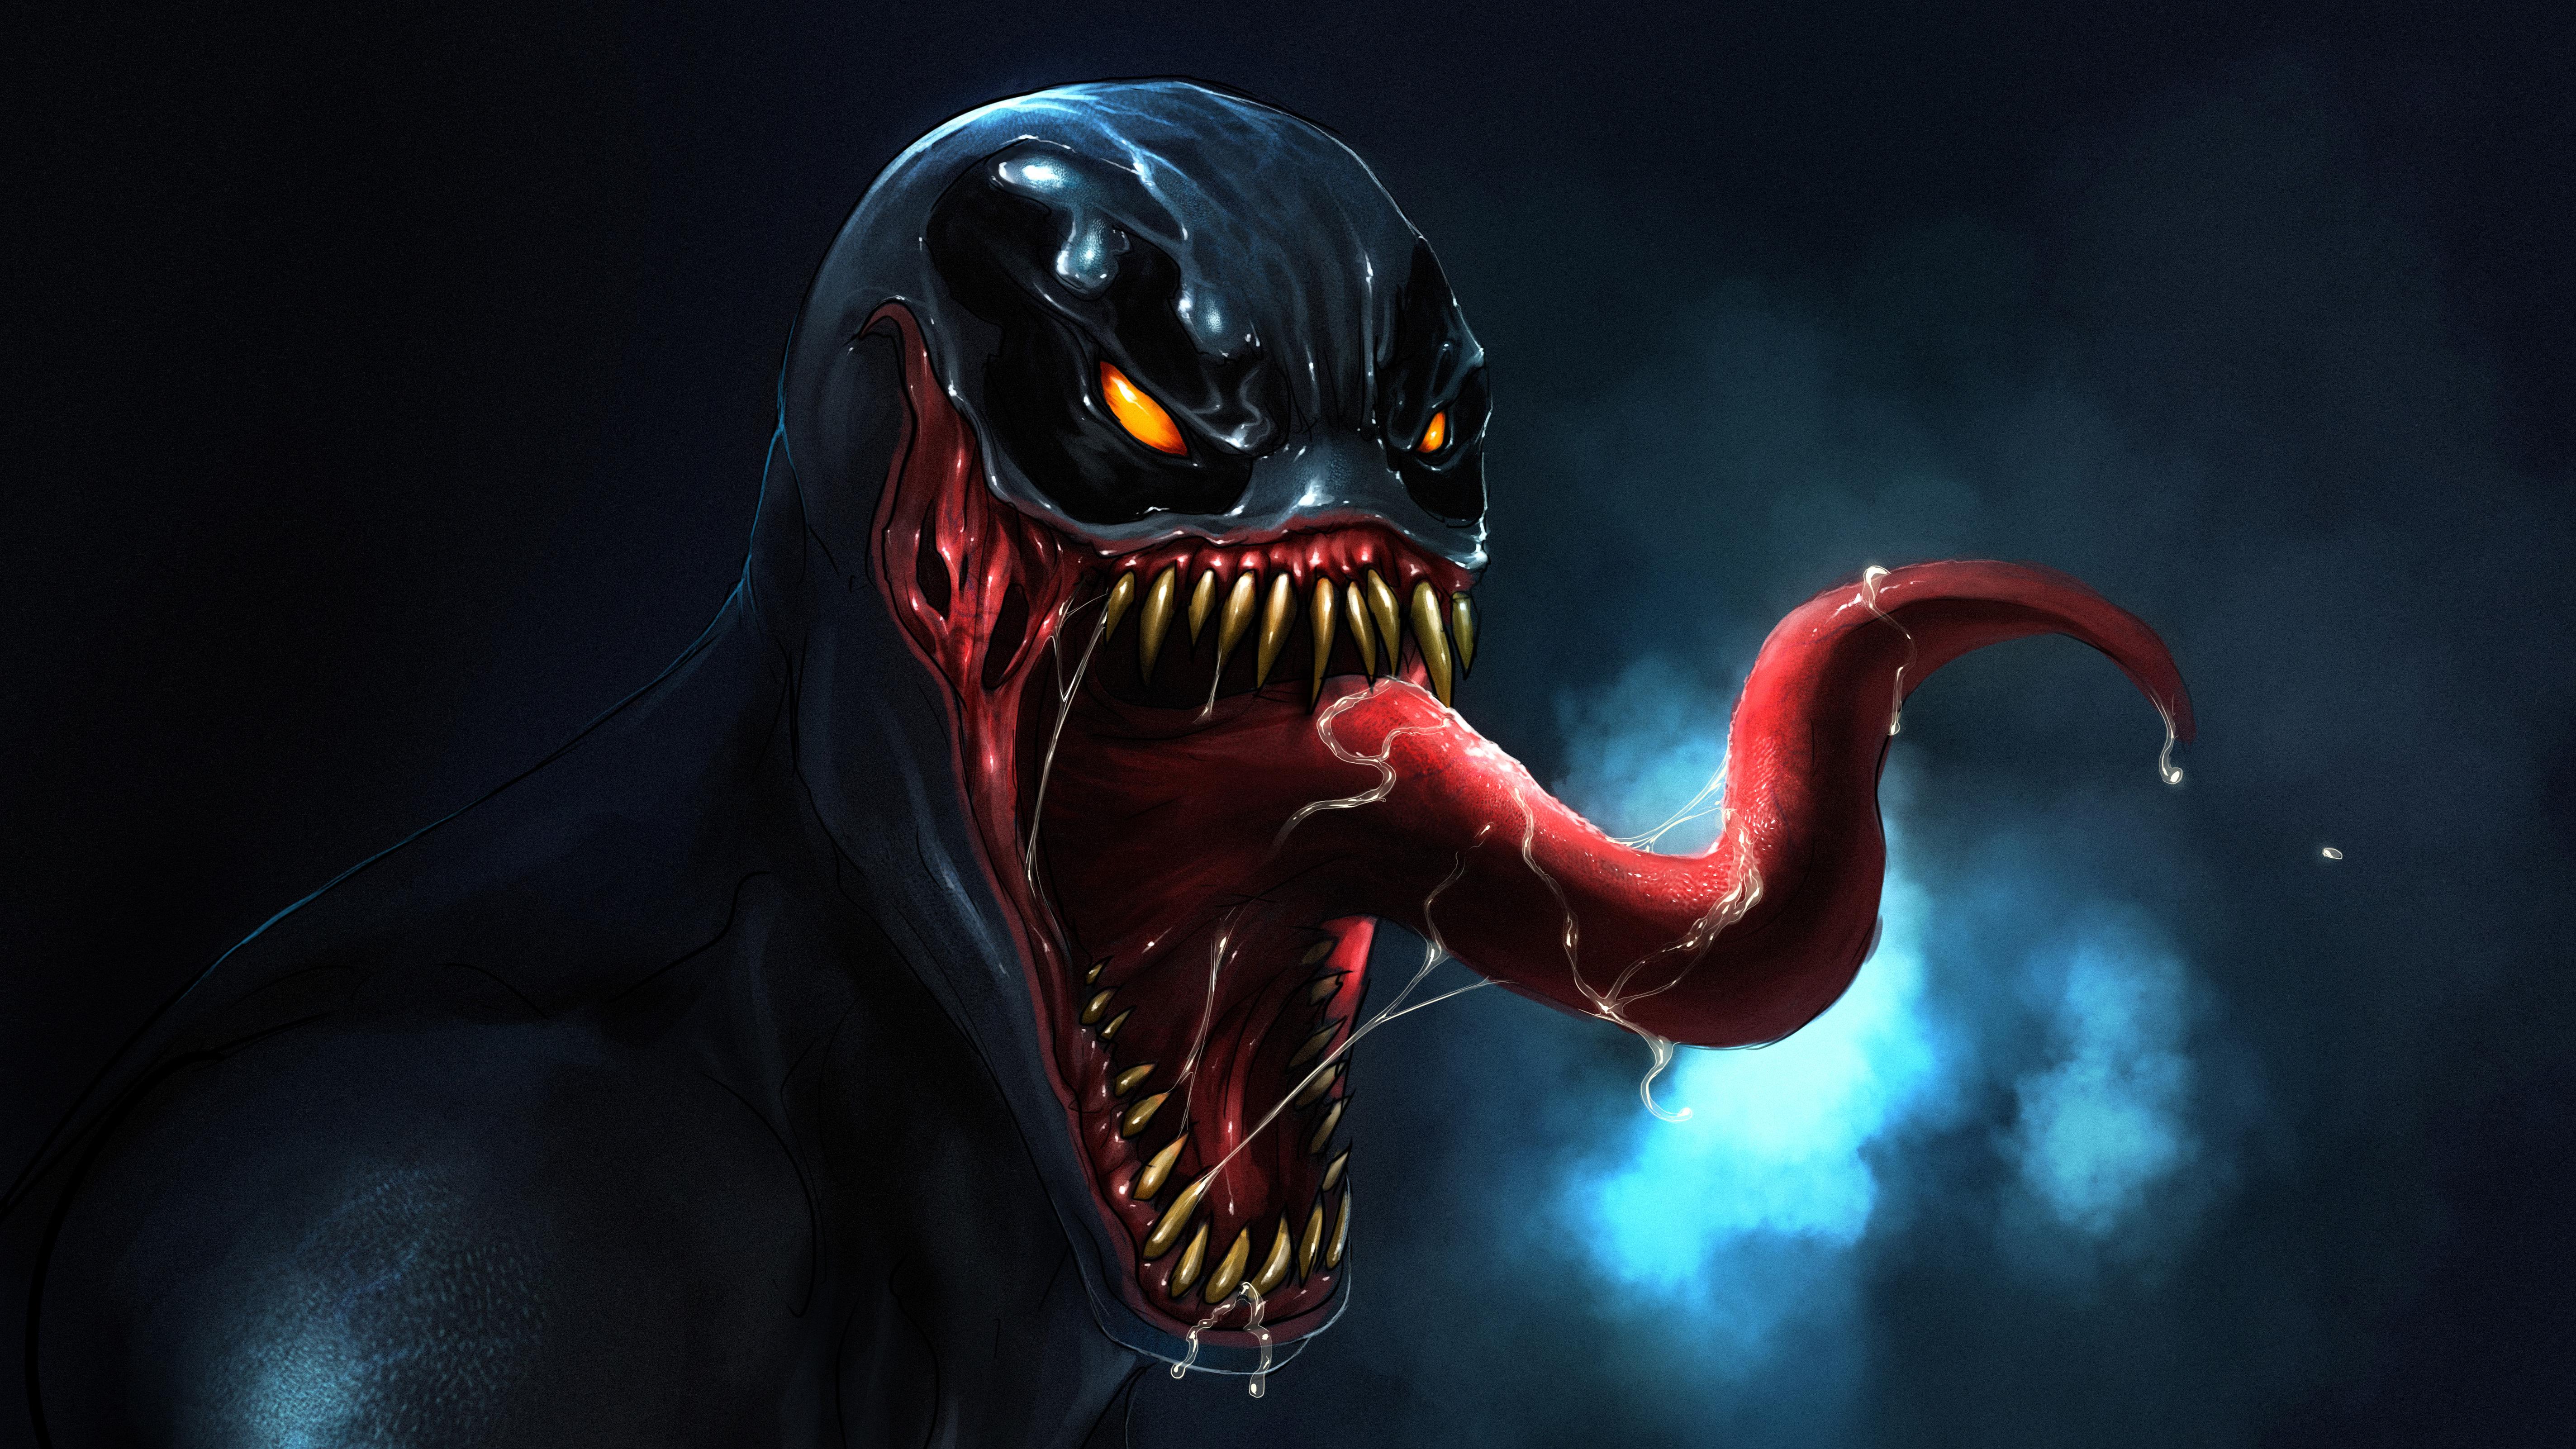 Venom 5k artwork hd superheroes 4k wallpapers images - 4k wallpaper venom ...